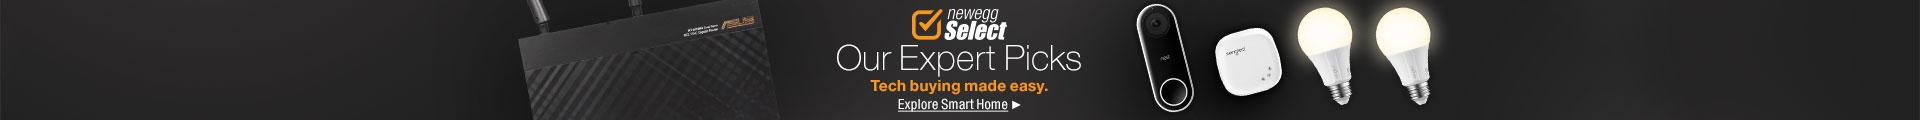 newegg select Our Expert Picks